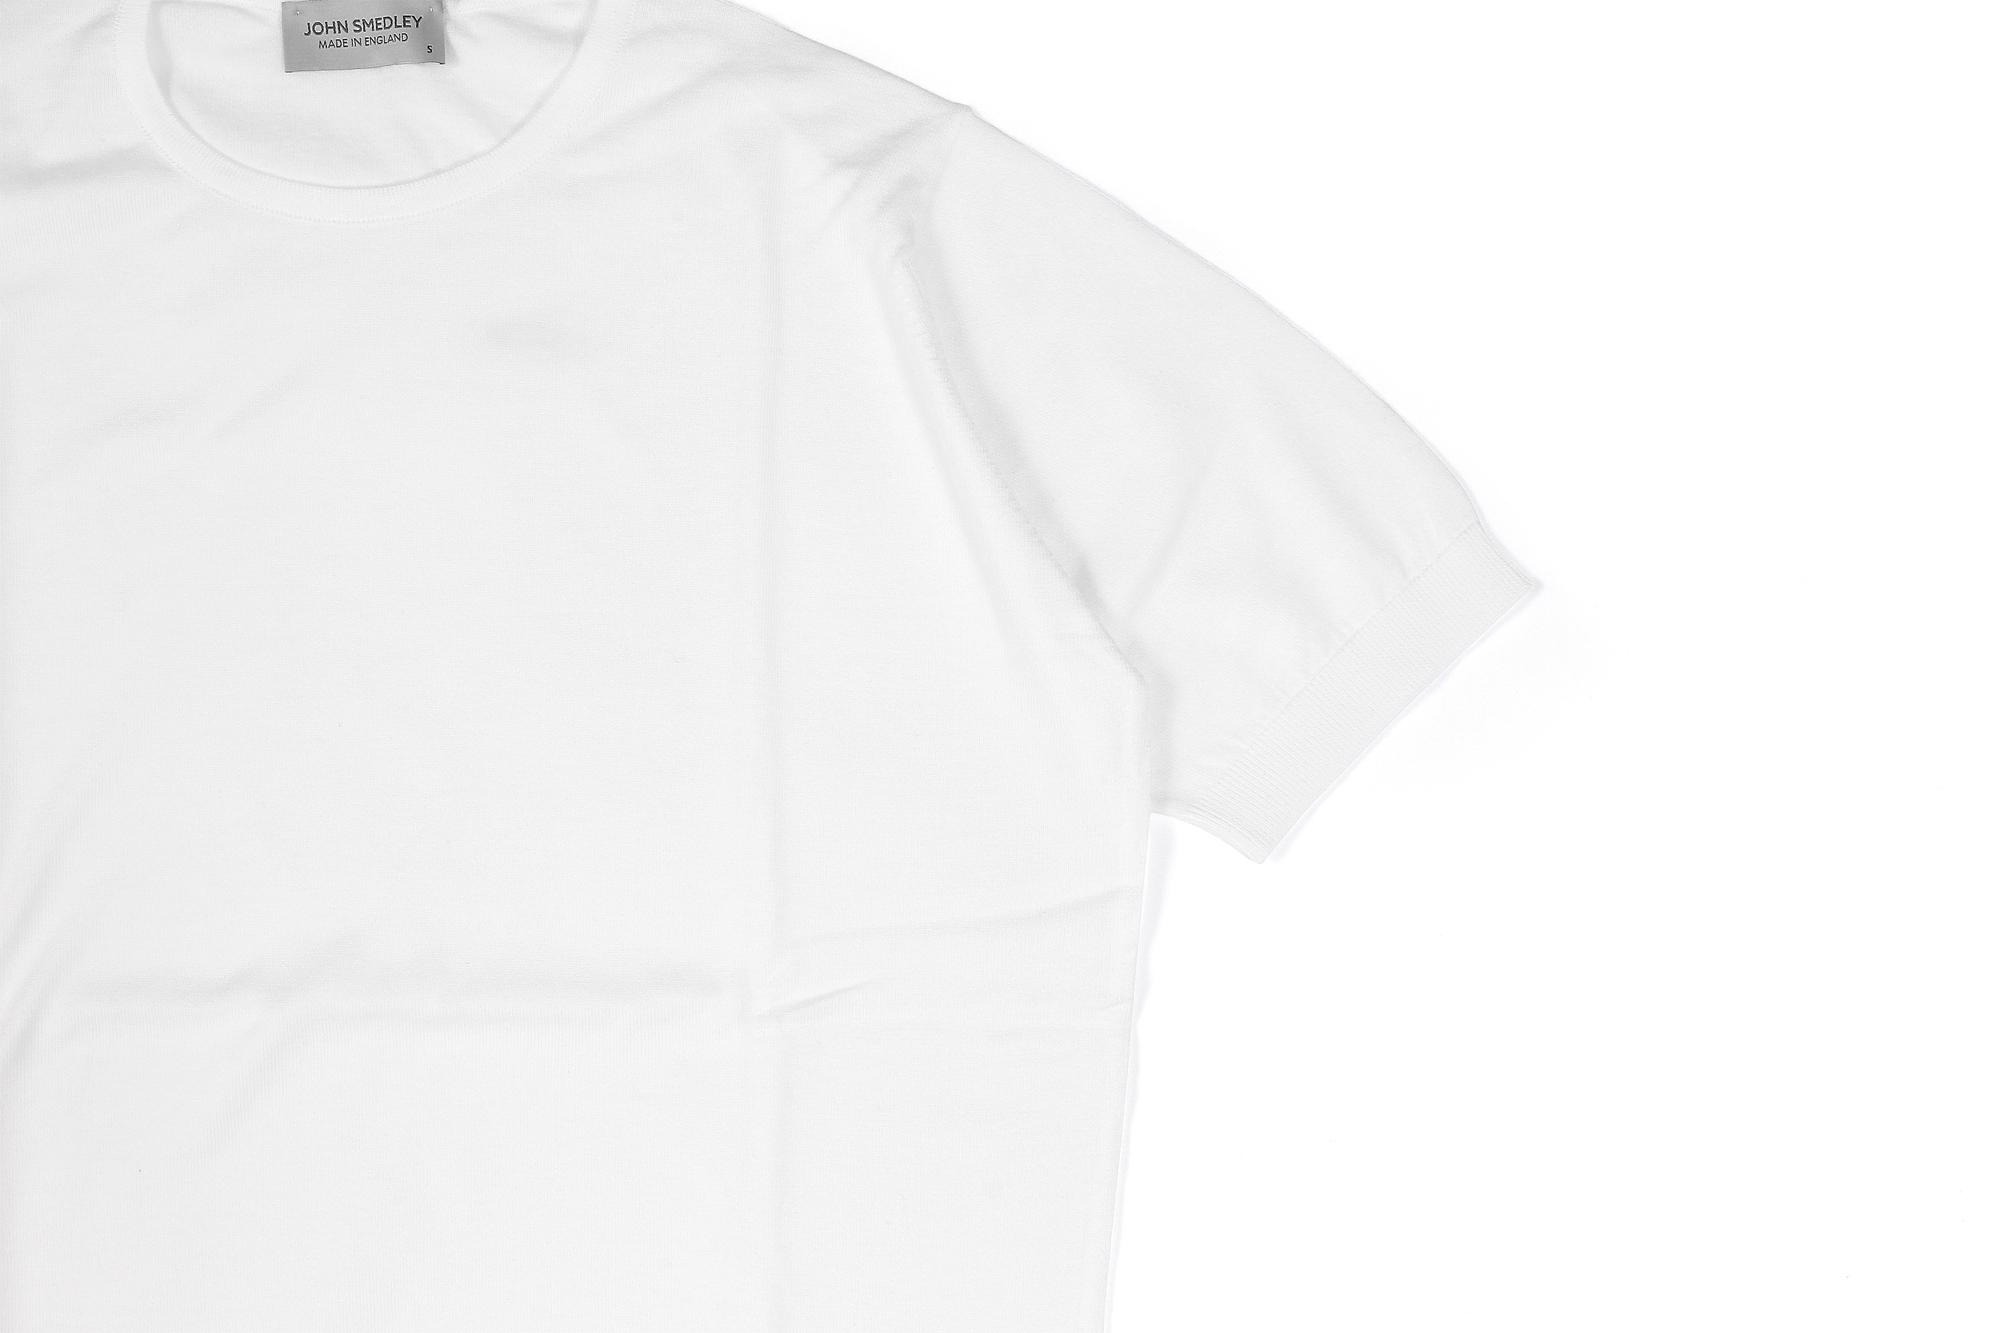 JOHN SMEDLEY(ジョンスメドレー) BELDEN (ベルデン) SEA ISLAND COTTON (シーアイランドコットン) ショートスリーブ コットンニット Tシャツ WHITE (ホワイト) Made in England (イギリス製) 2020 春夏新作 愛知 名古屋 altoediritto アルトエデリット